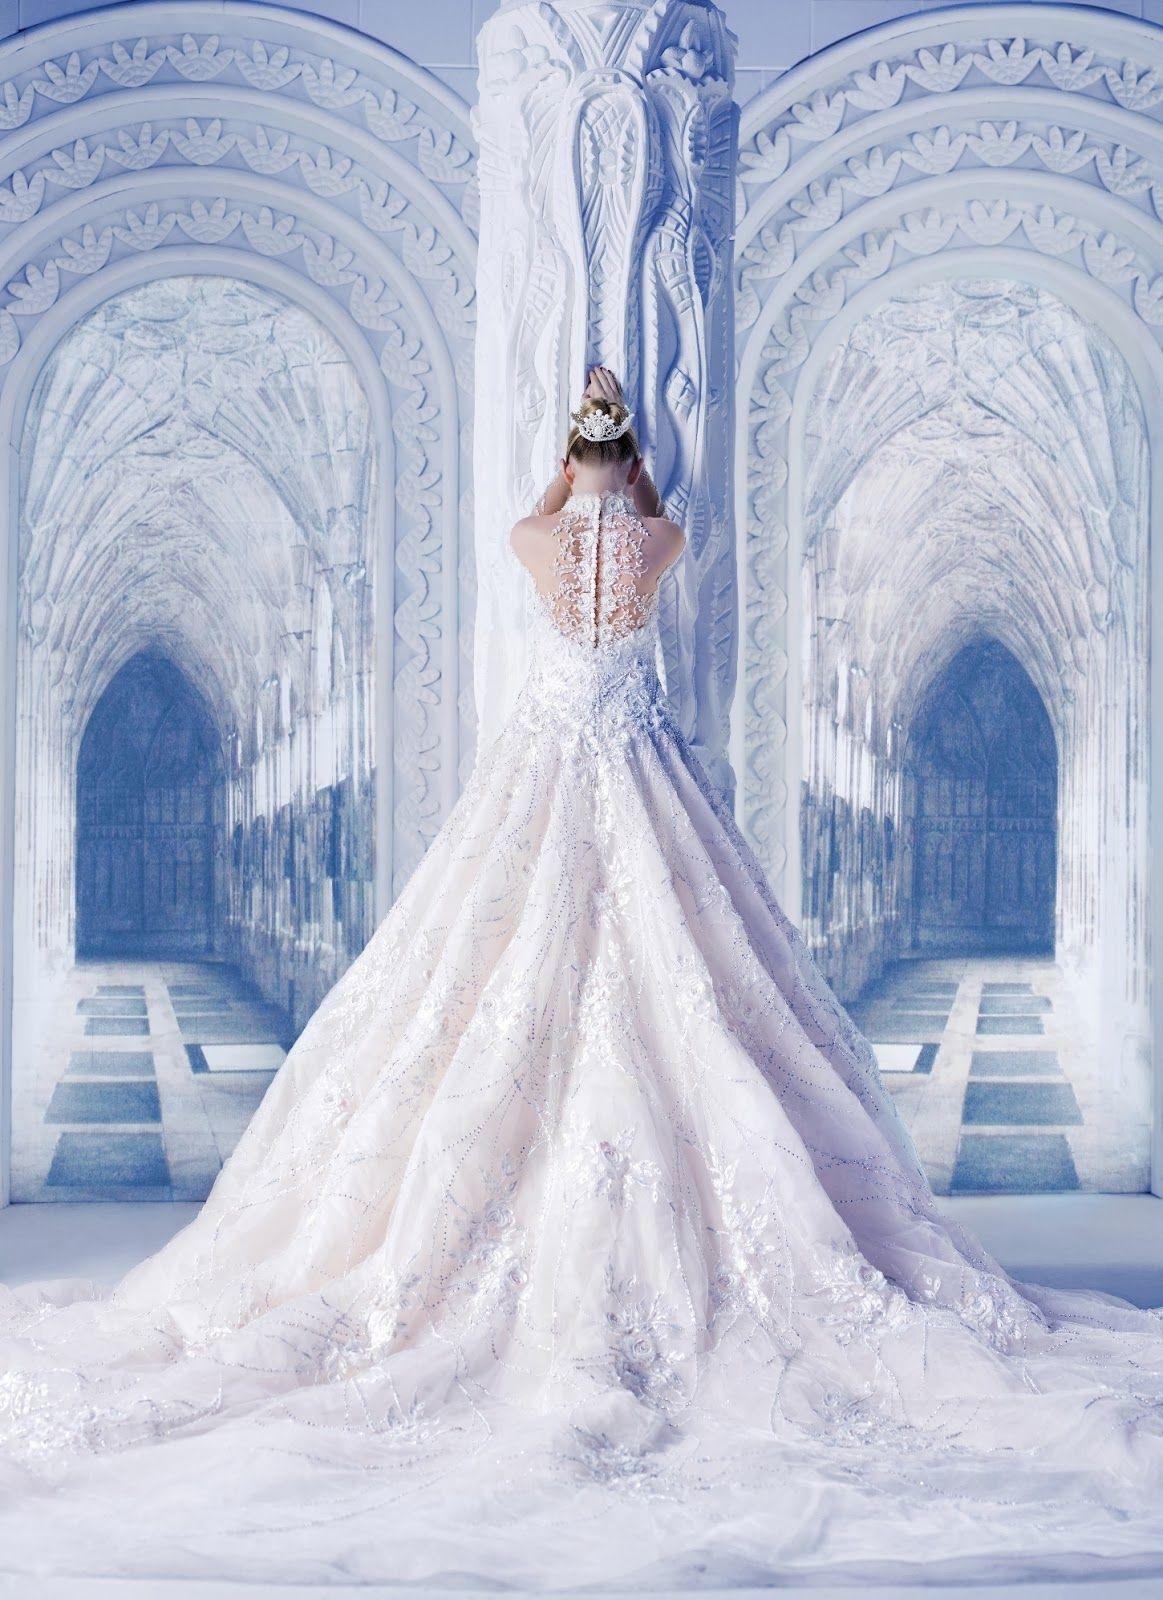 AMORE (Beauty + Fashion) ❣ WEDDING BELL WEDNESDAY ❣ - Michael ...